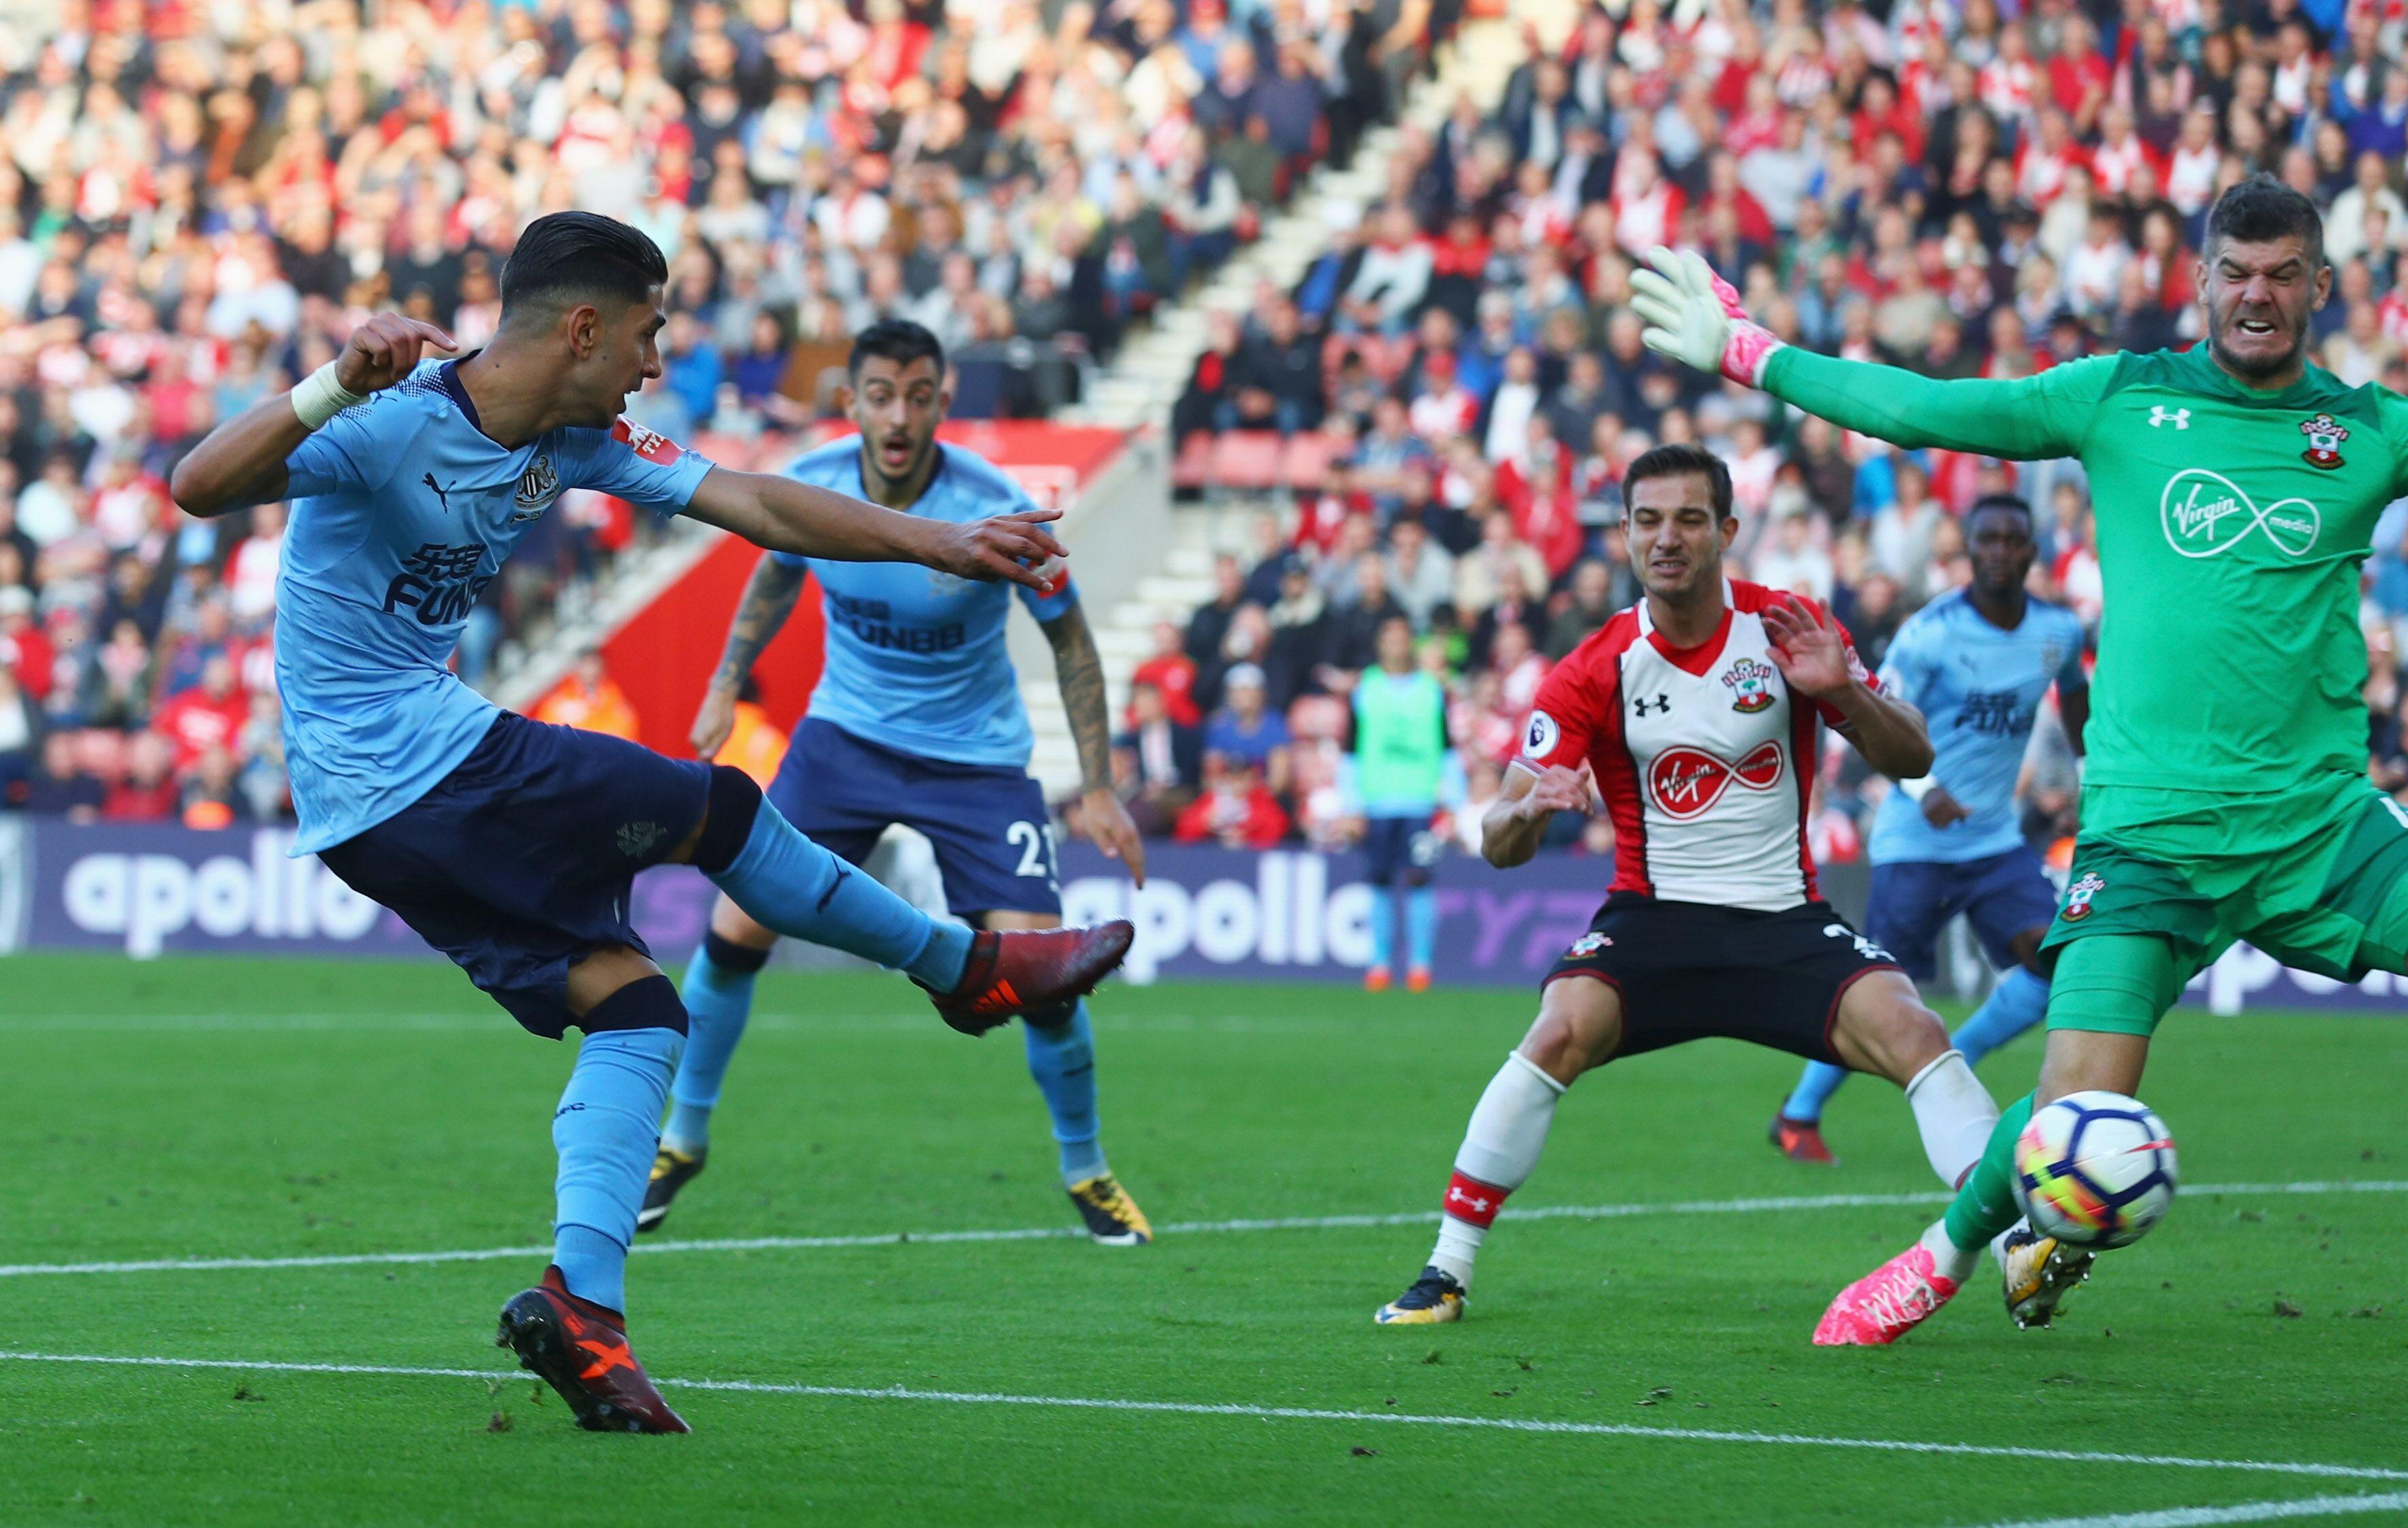 Southampton England October 15 Ayoze Perez Of Newcastle United Scores Their Second Goal